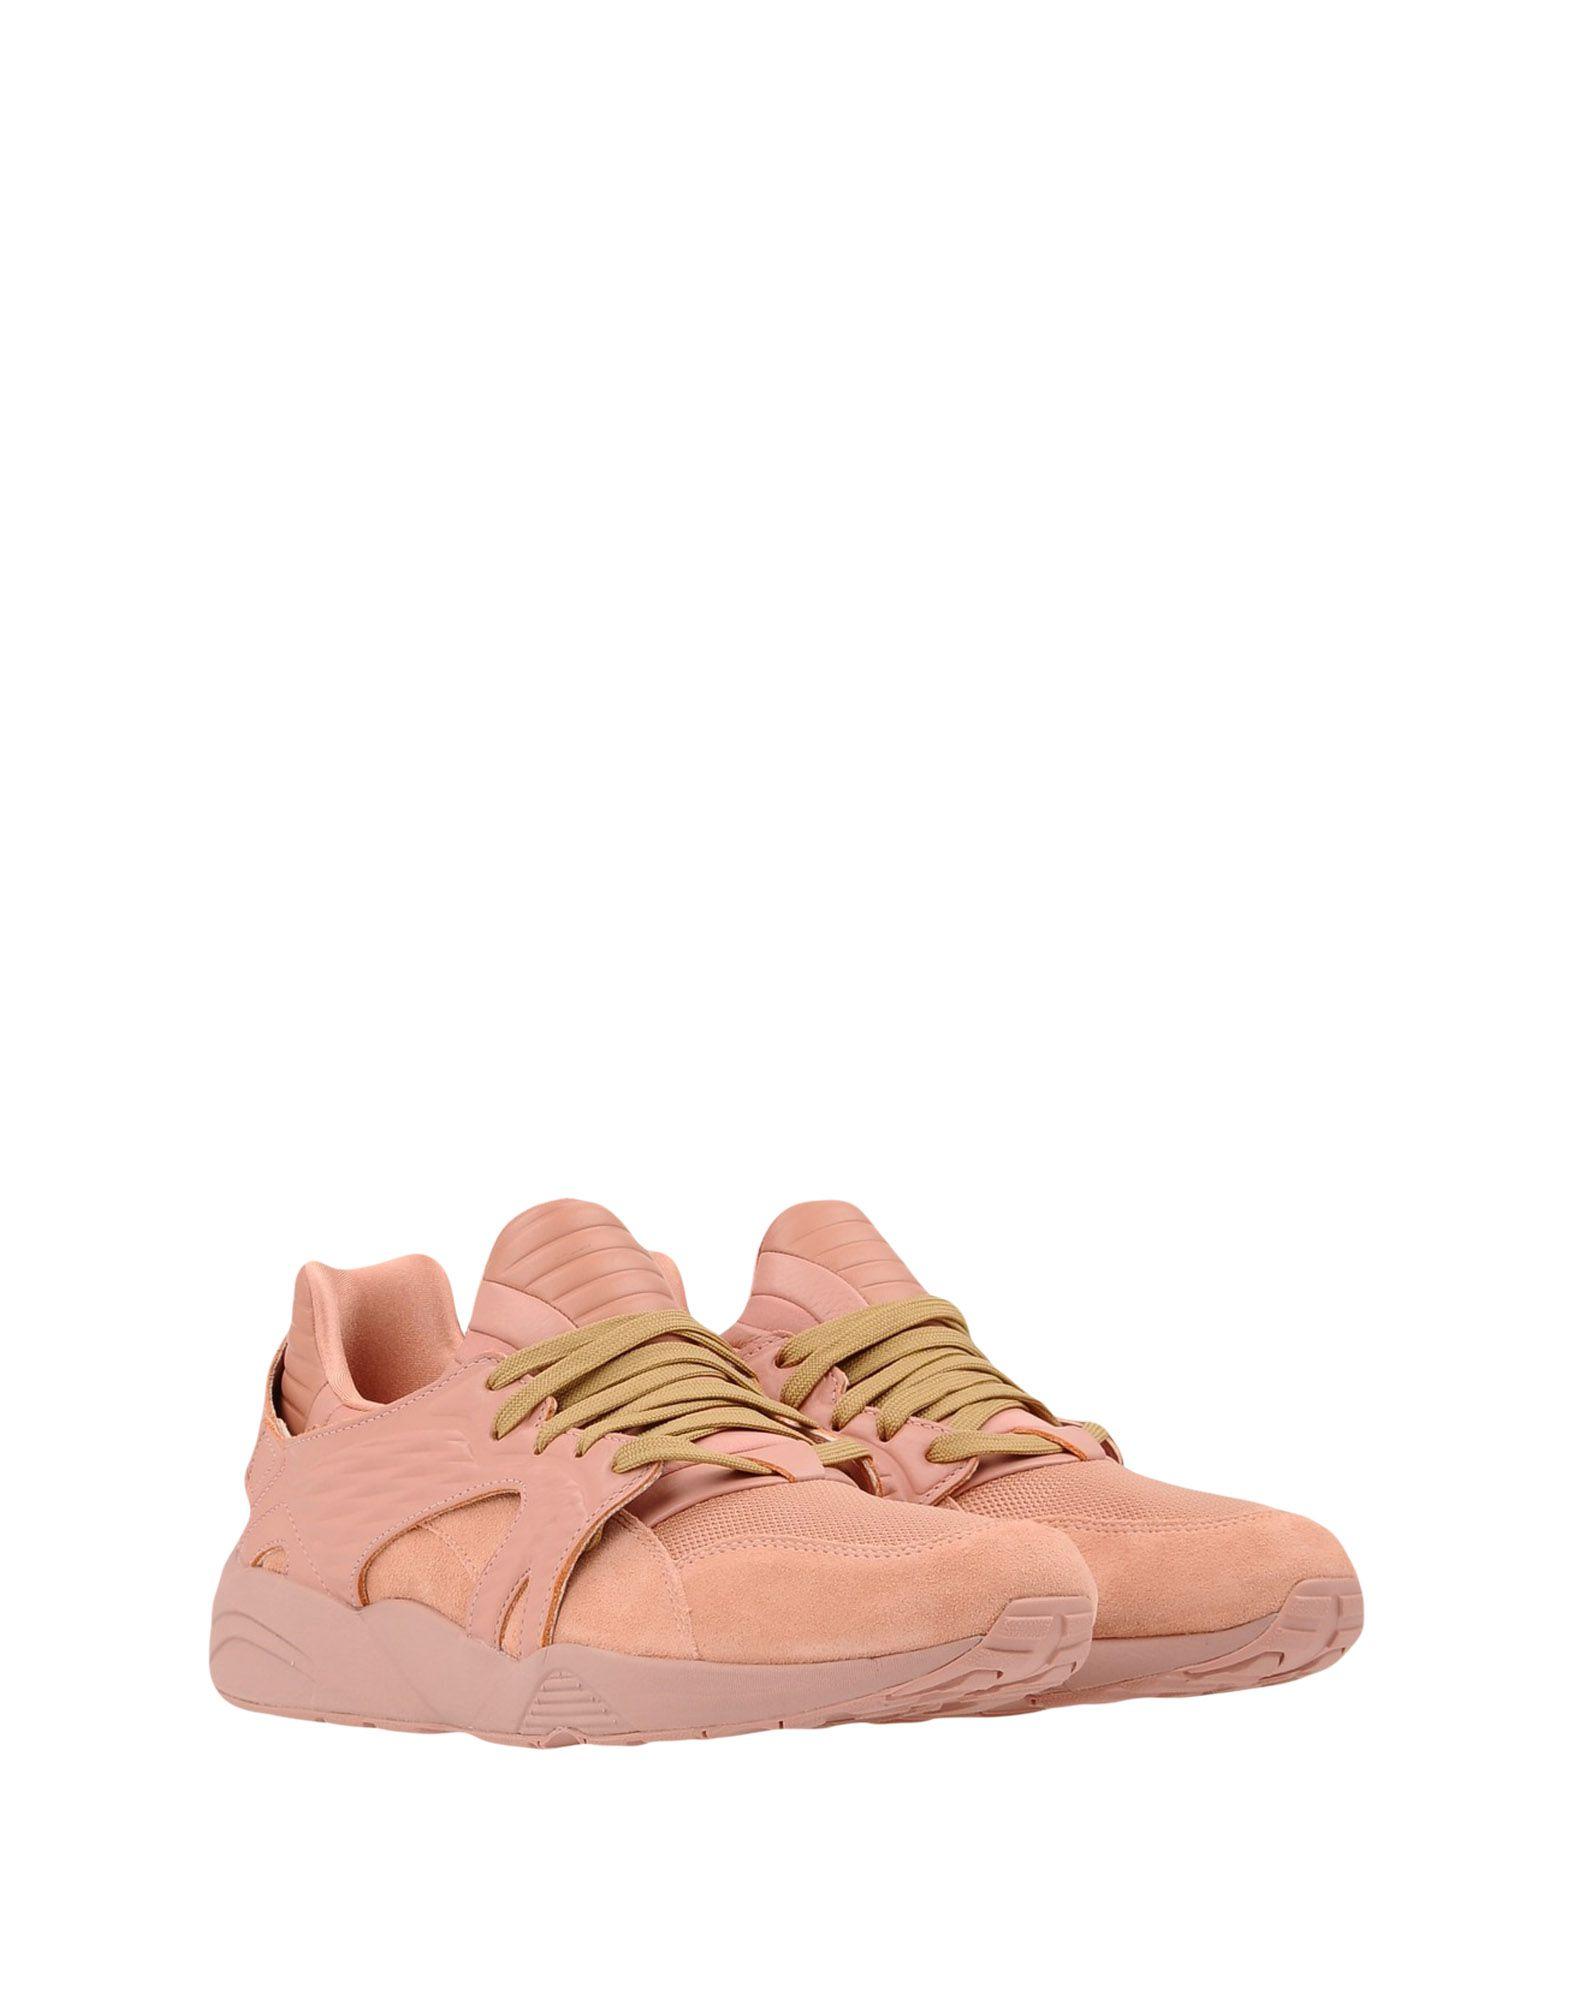 Rabatt  echte Schuhe Puma X Han Kjøbenhavn  Rabatt Blaze Cage  11379835SF 5fcfed